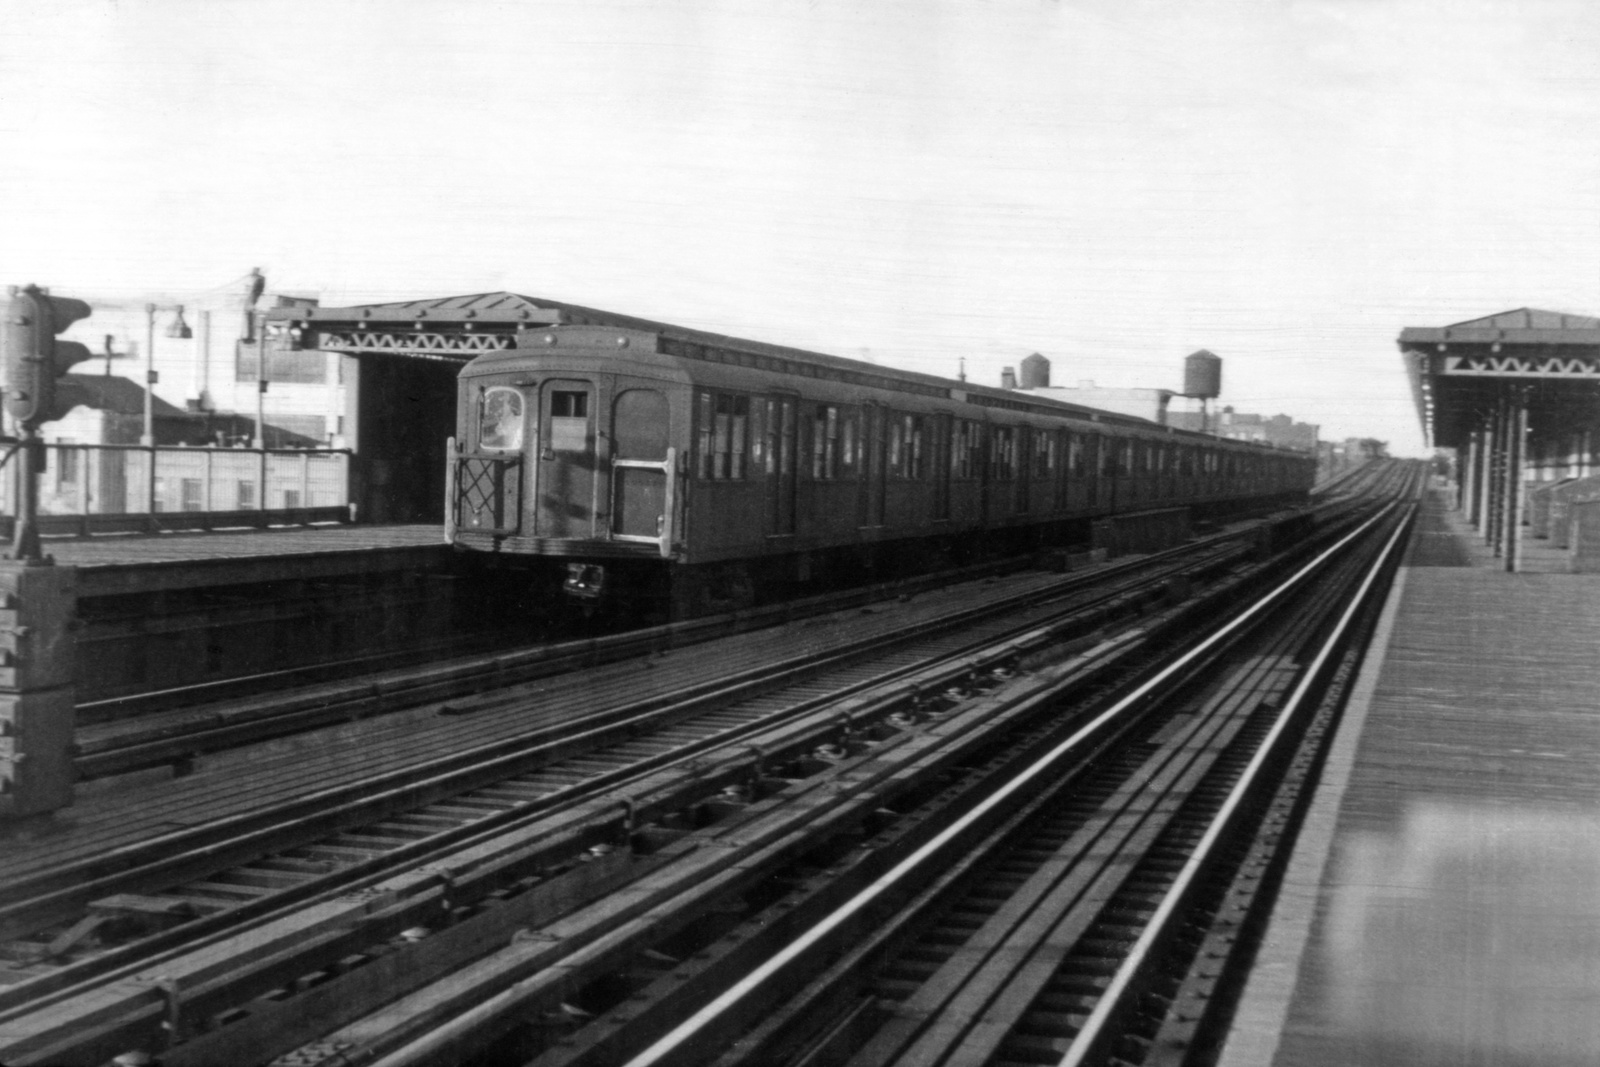 (142k, 1024x659)<br><b>Country:</b> United States<br><b>City:</b> New York<br><b>System:</b> New York City Transit<br><b>Line:</b> BMT Astoria Line<br><b>Location:</b> 39th/Beebe Aves. <br><b>Car:</b> BMT A/B-Type Standard  <br><b>Collection of:</b> Joe Testagrose<br><b>Viewed (this week/total):</b> 0 / 3098